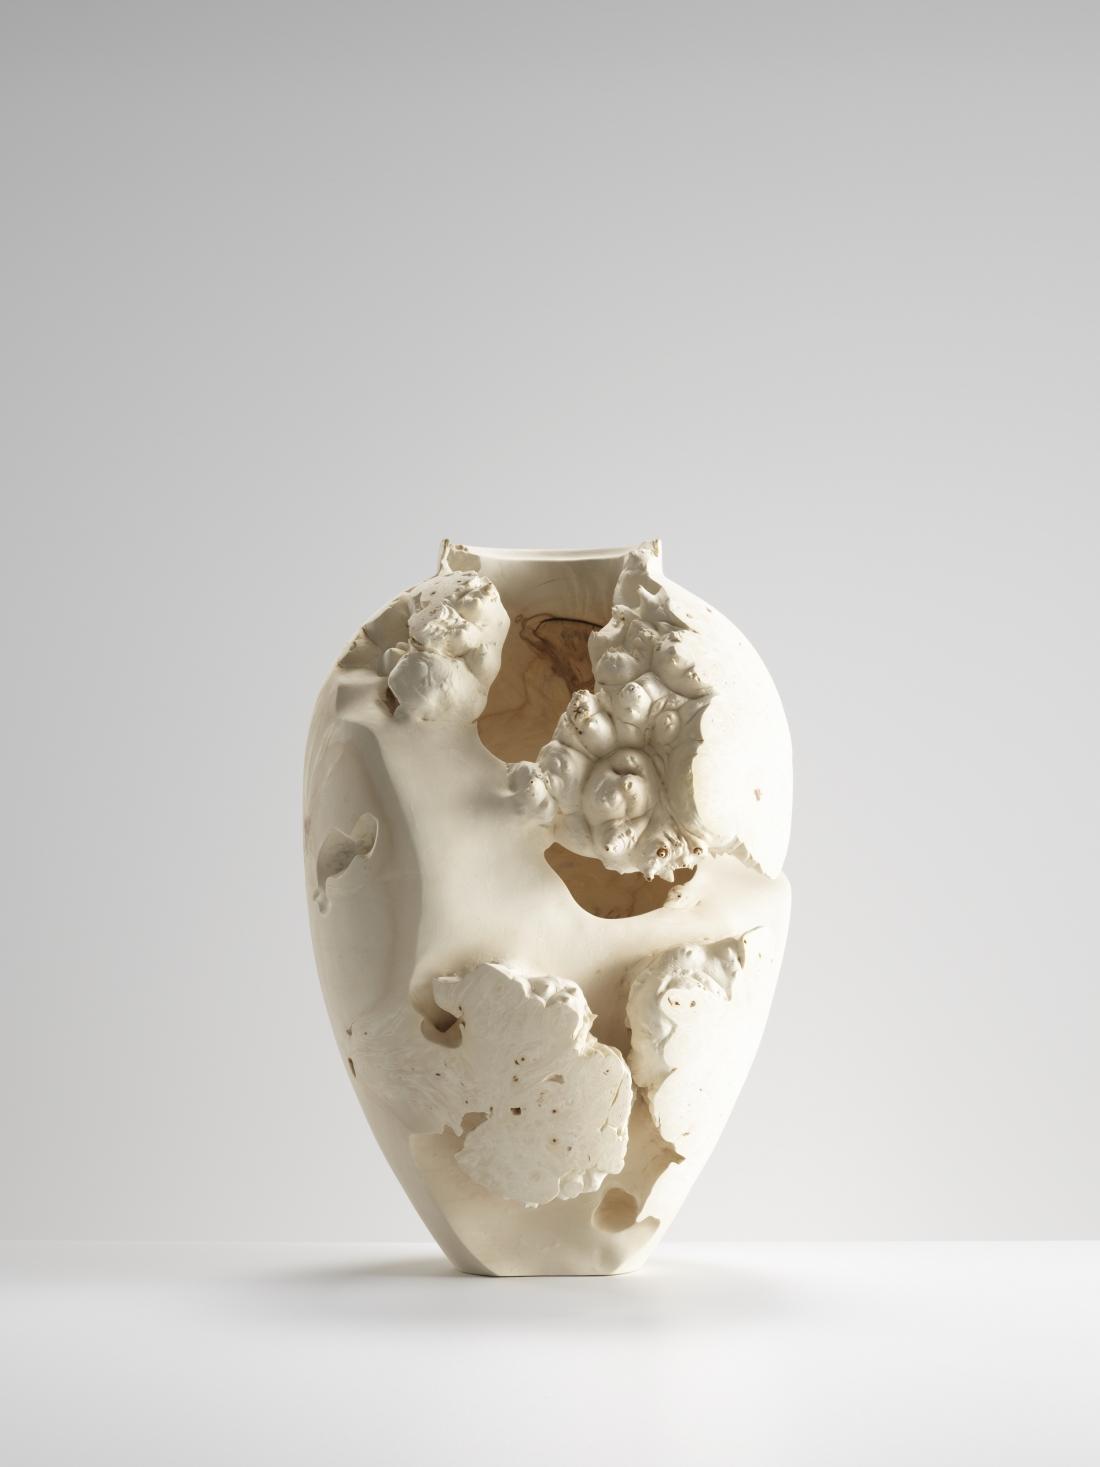 Eleanor Lakelin - Echoes of Amphora - Vase II, 2020, horse chestnut